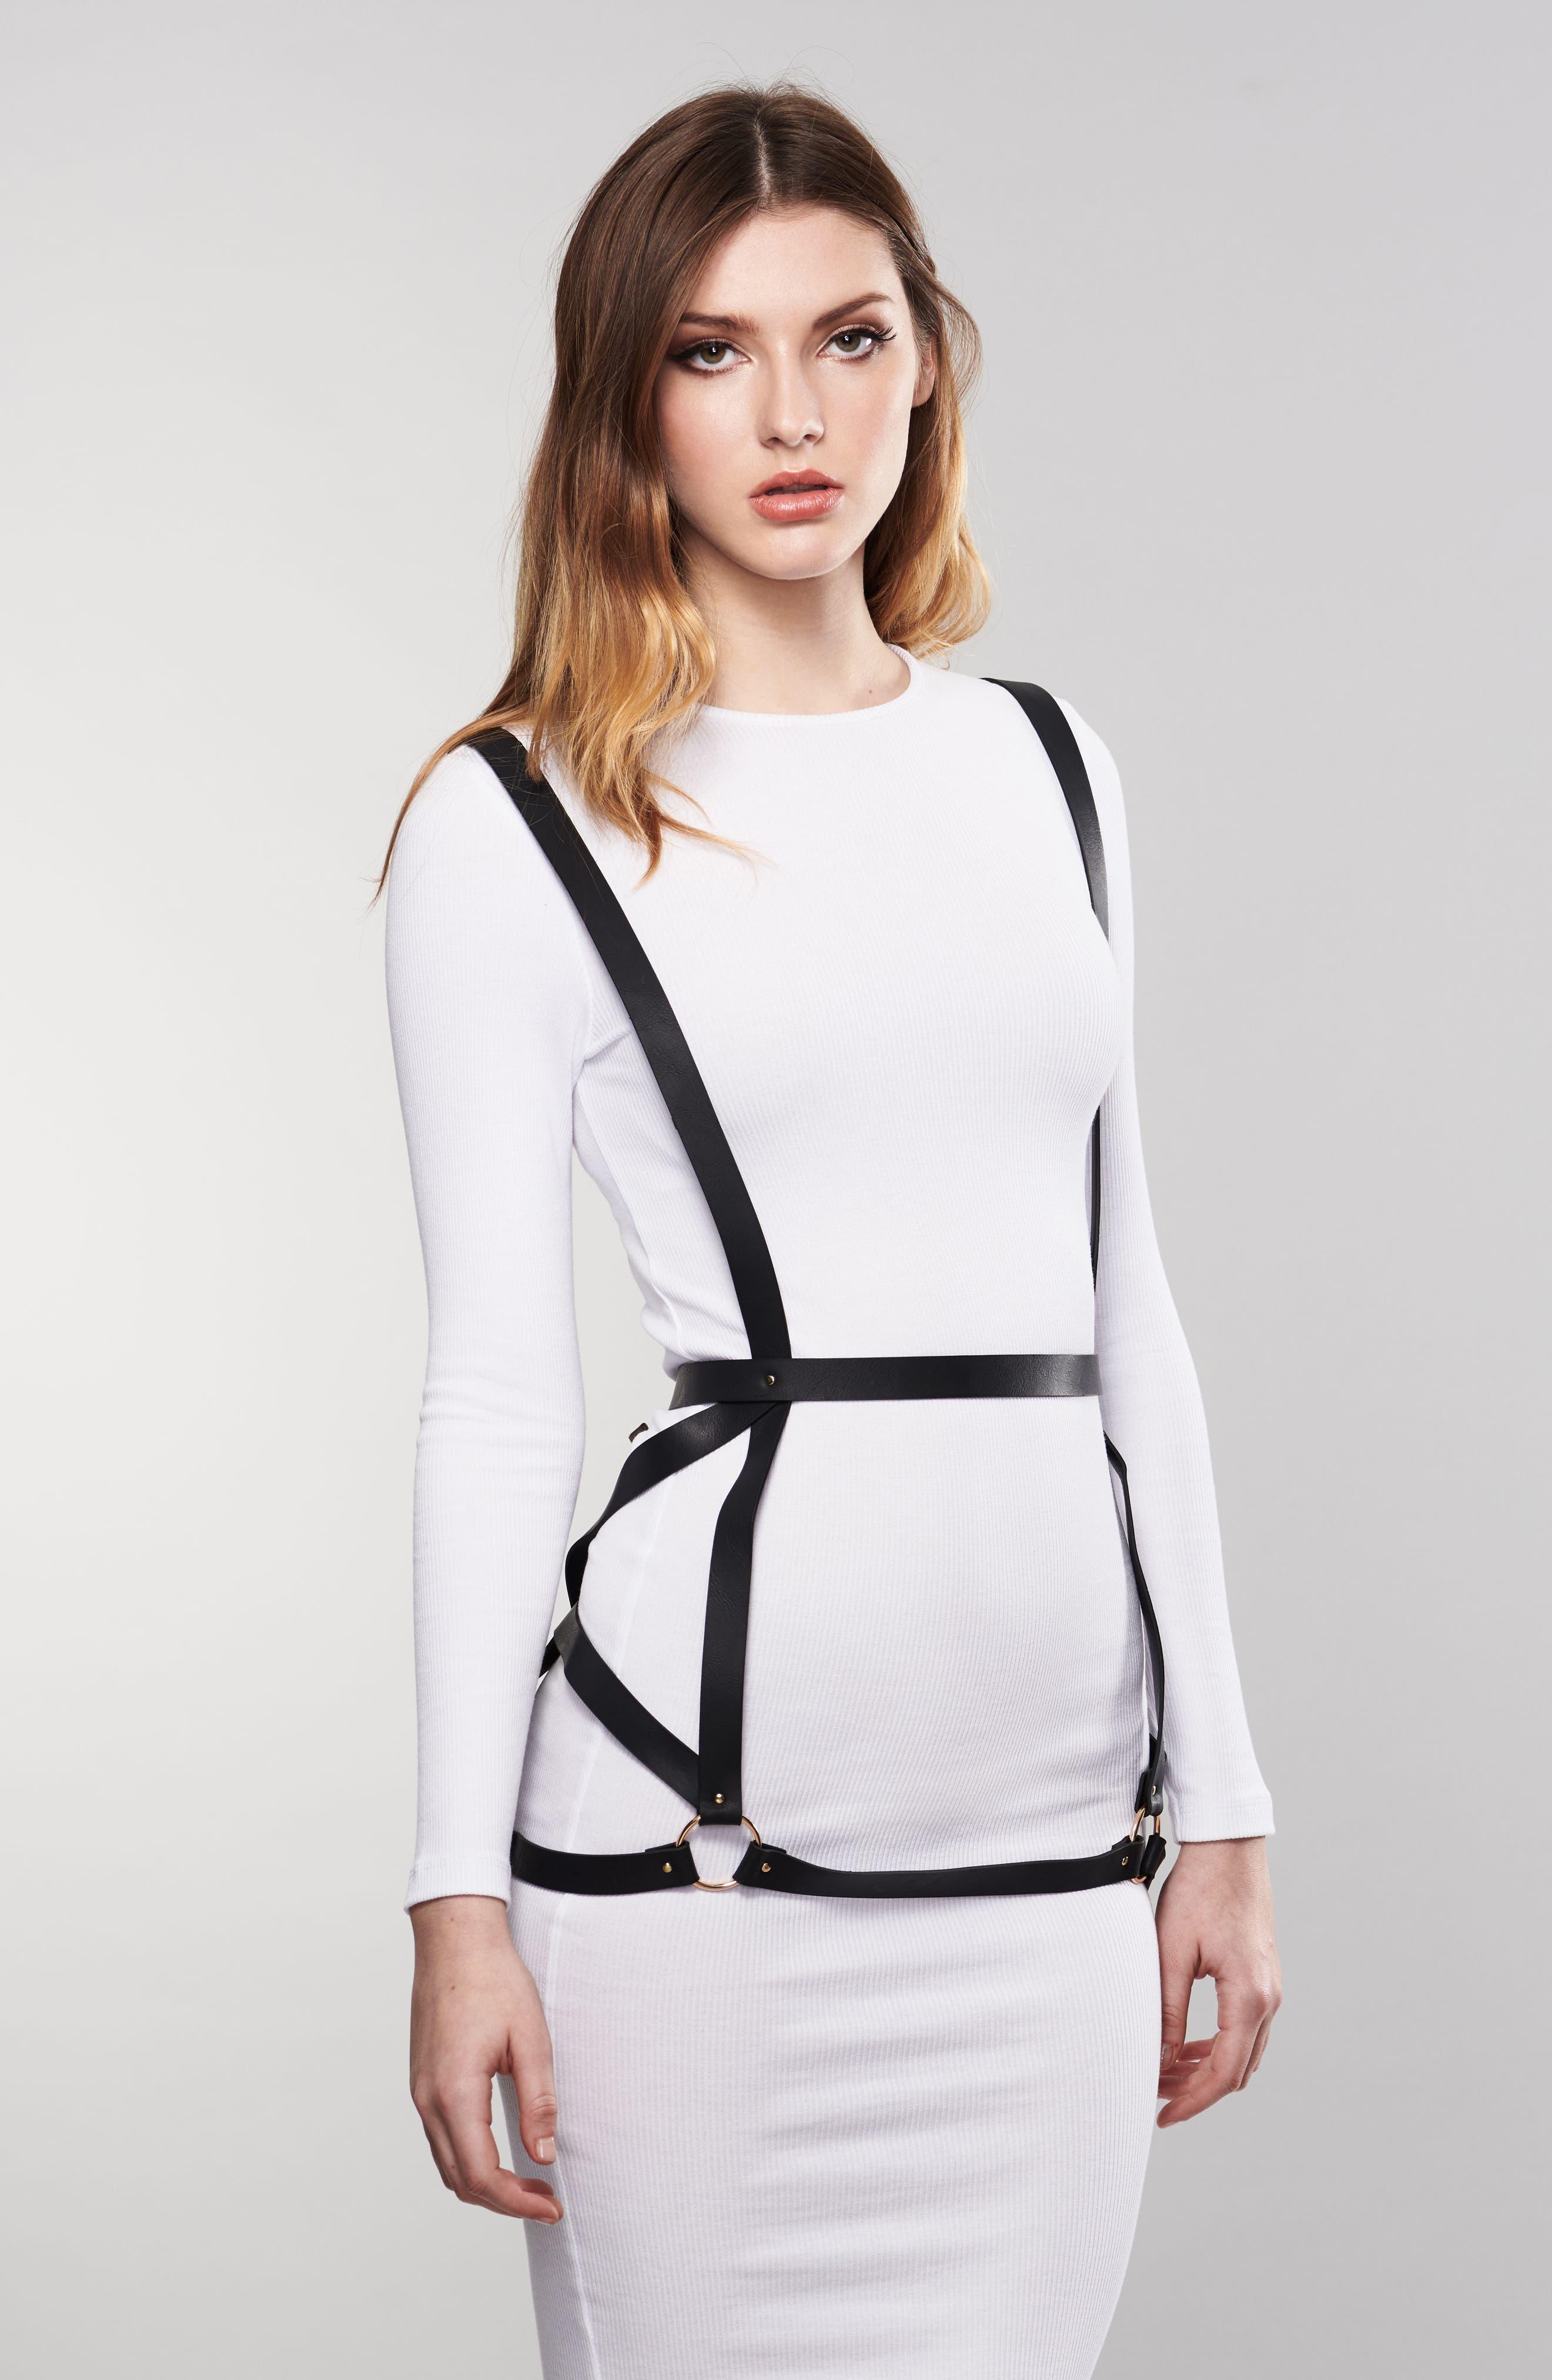 Maze Arrow Dress Harness,                             Alternate thumbnail 3, color,                             001